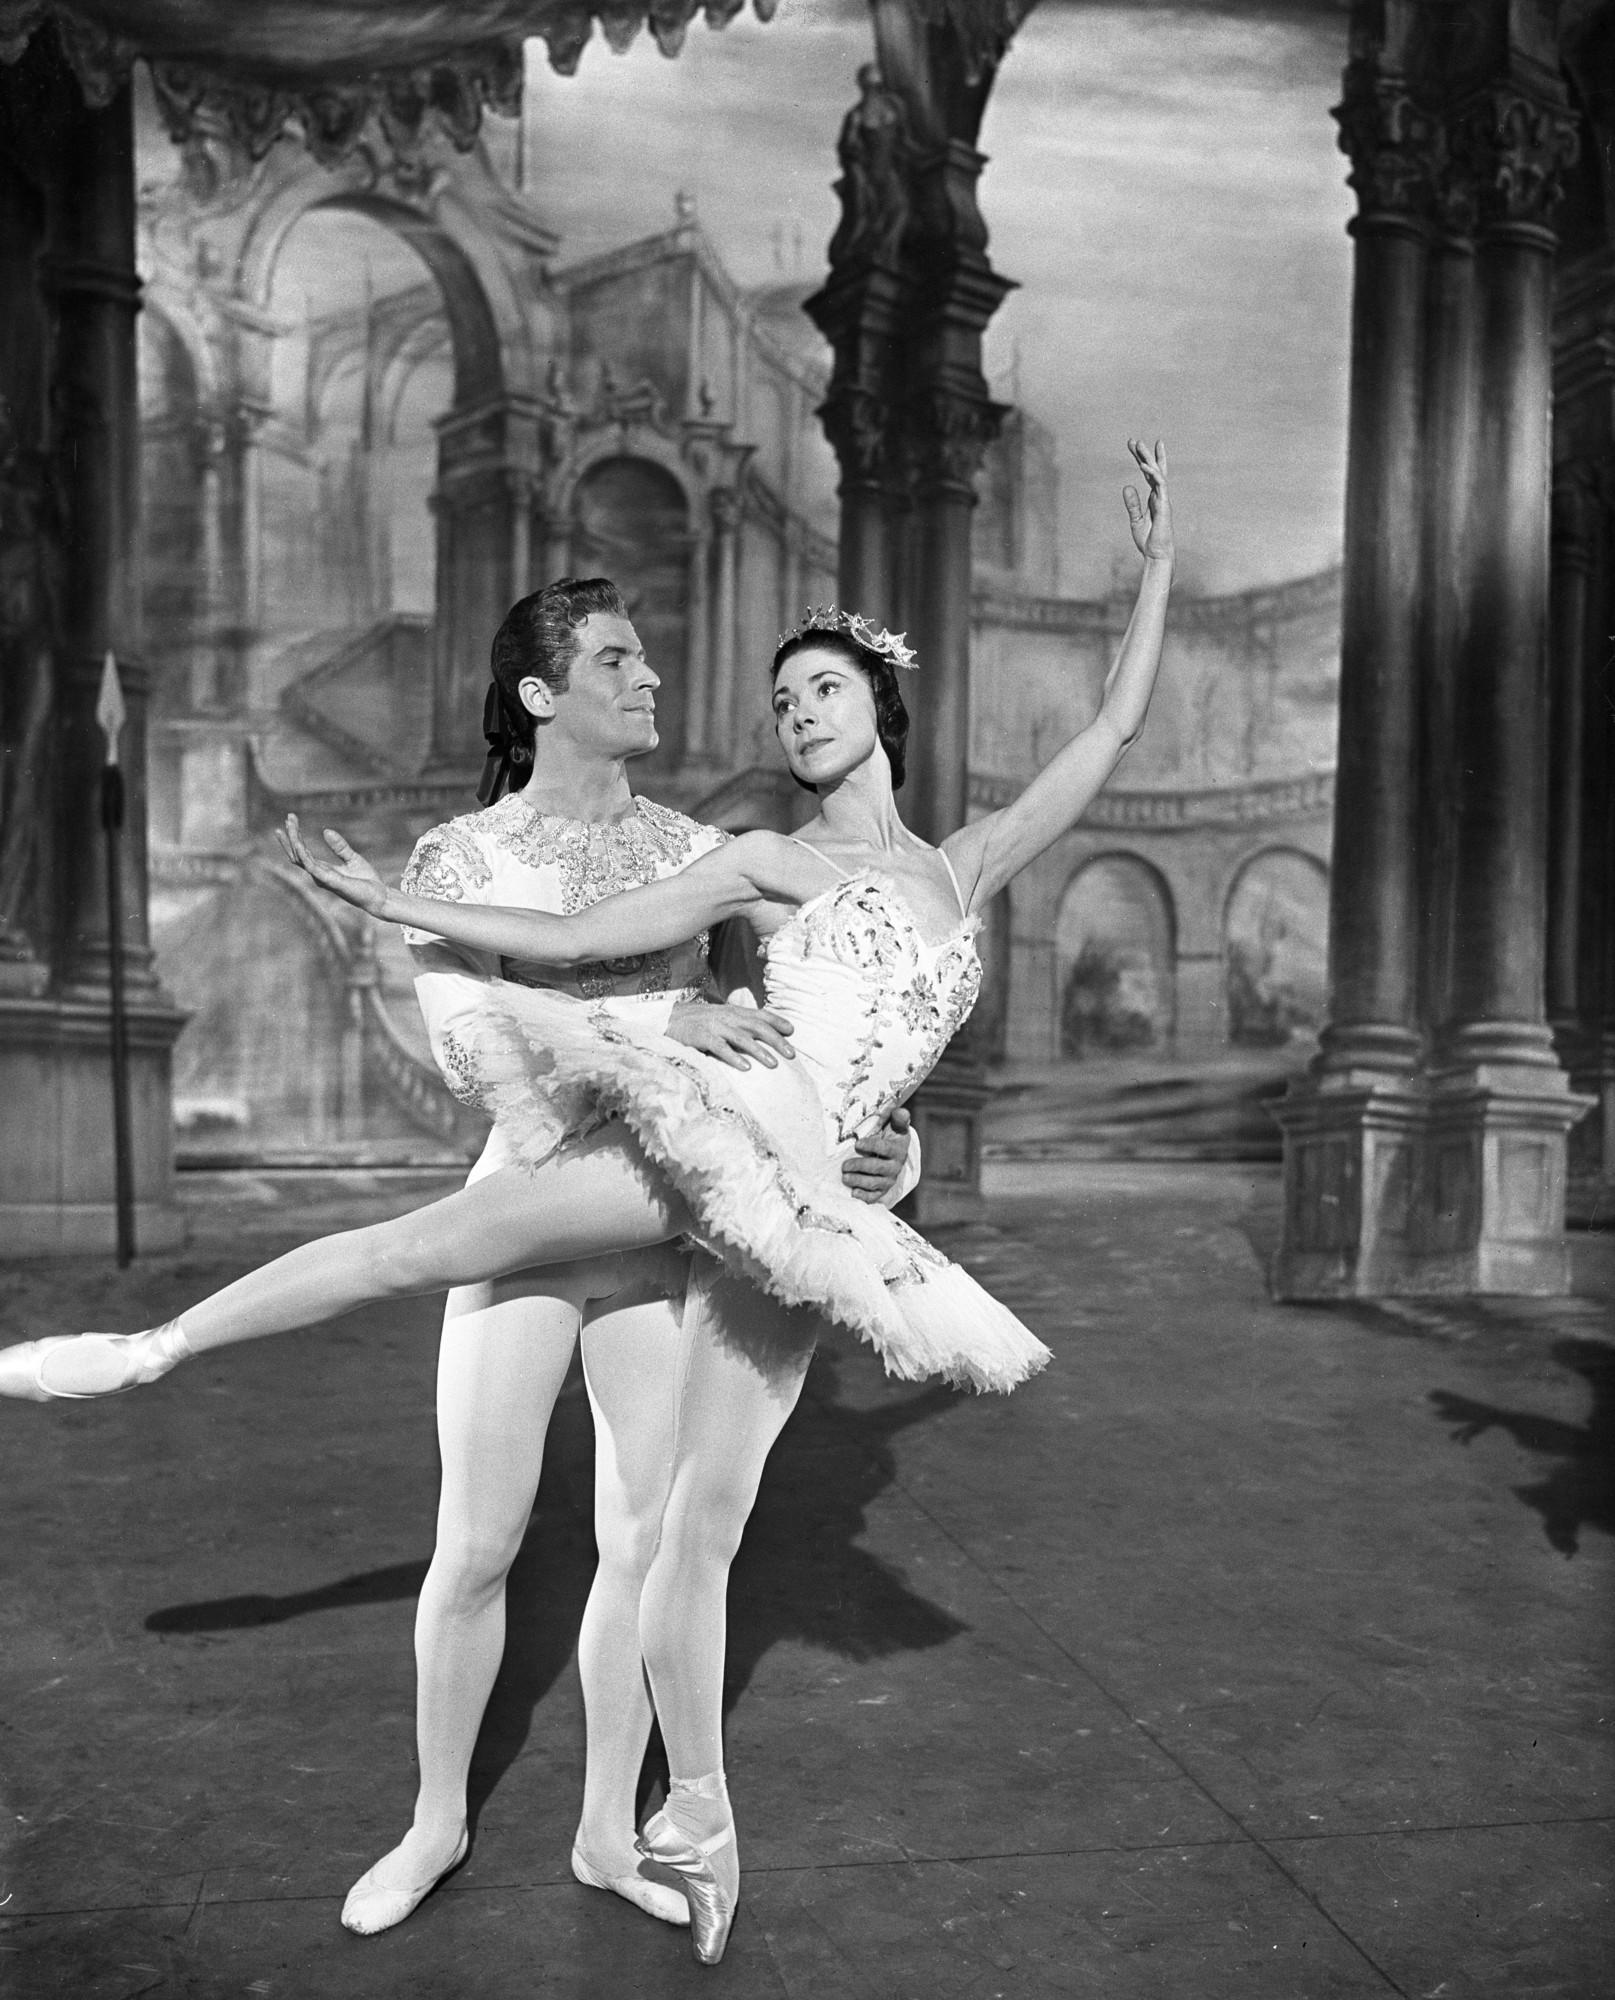 (L-R) Prince Florimund (MICHAEL SOMES), Princess Aurora (DAME MARGOT FONTAYNE) - (C) BBC - Photographer: Unknown